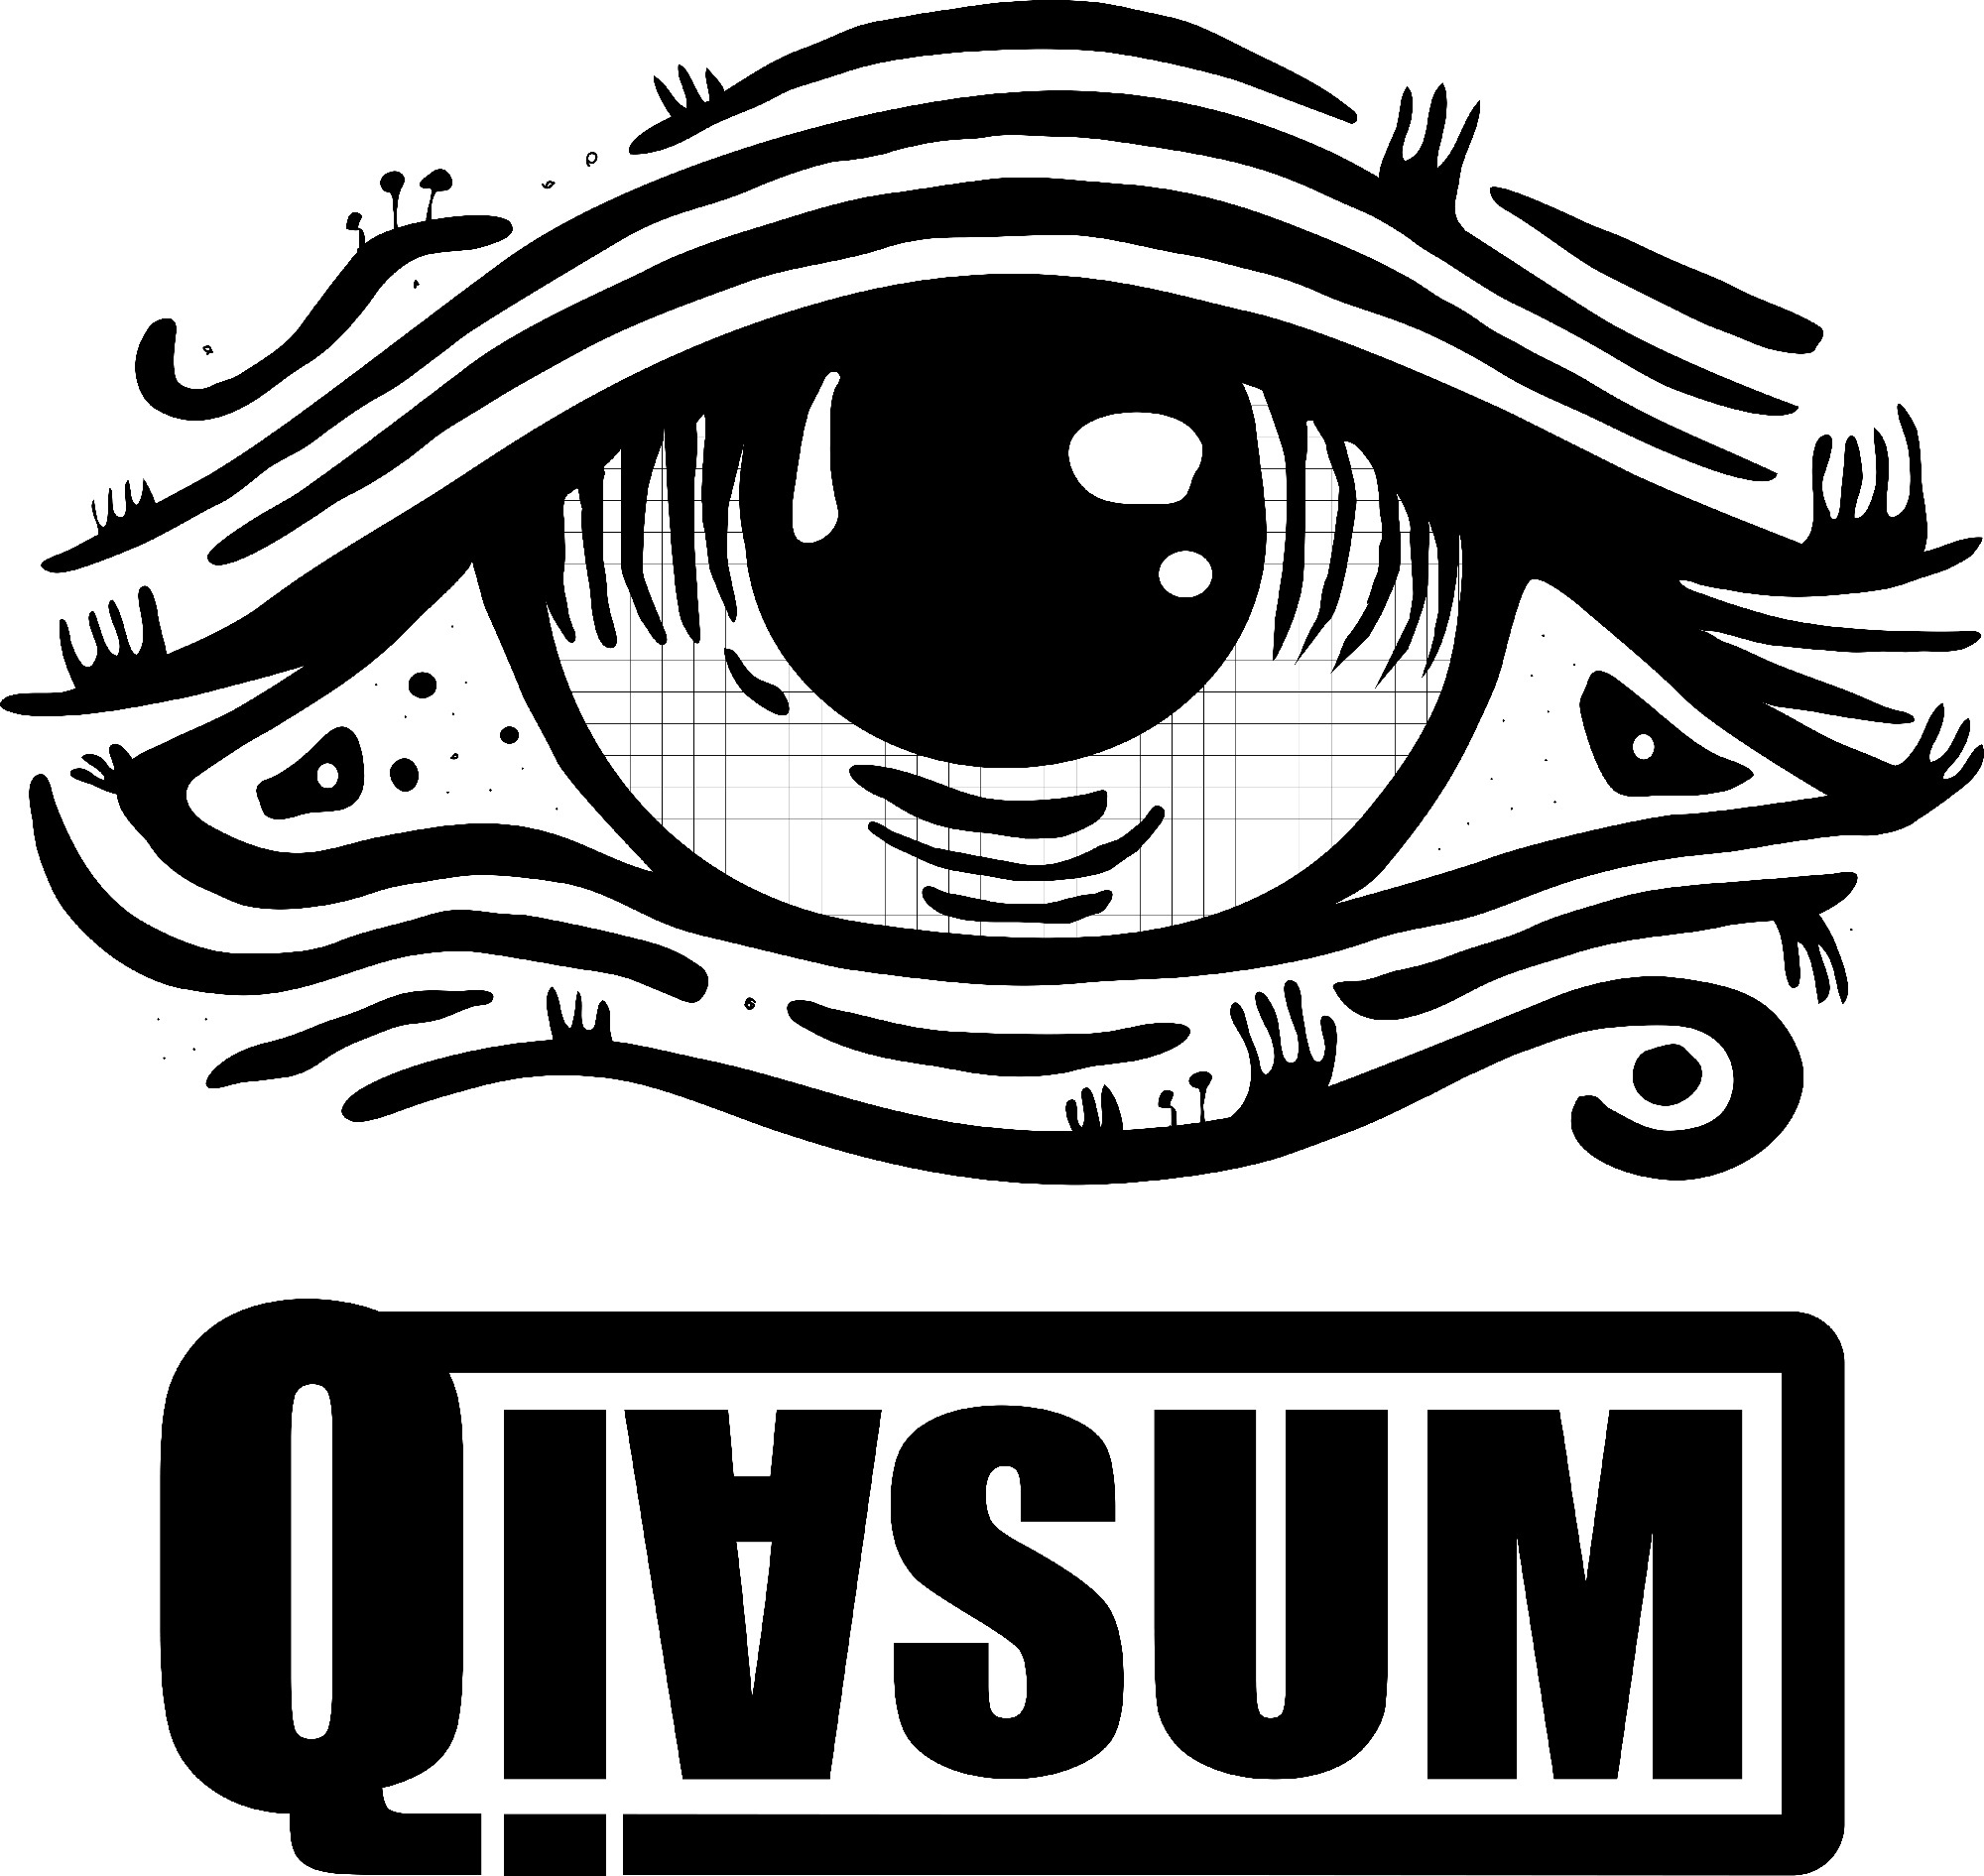 Qiasum Music